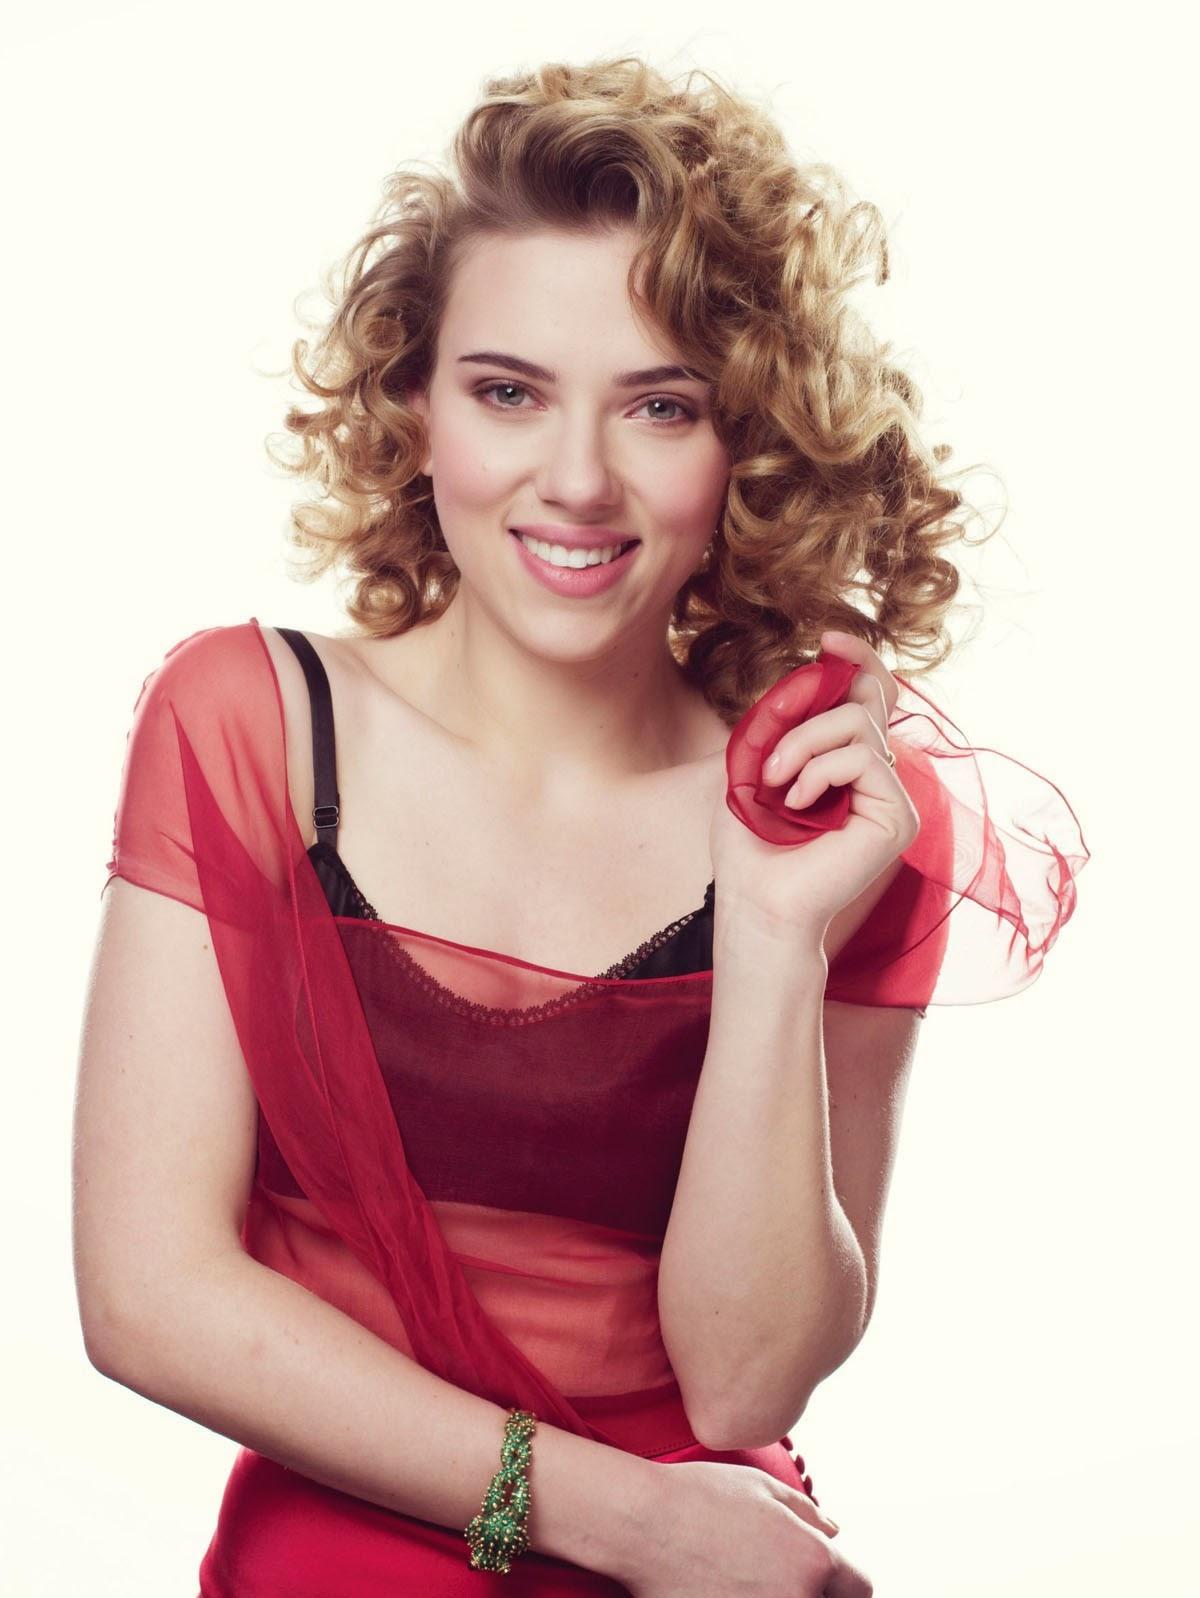 Cute Baby Girl Live Wallpaper Scarlett Johansson Hd Wallpaper All 4u Wallpaper